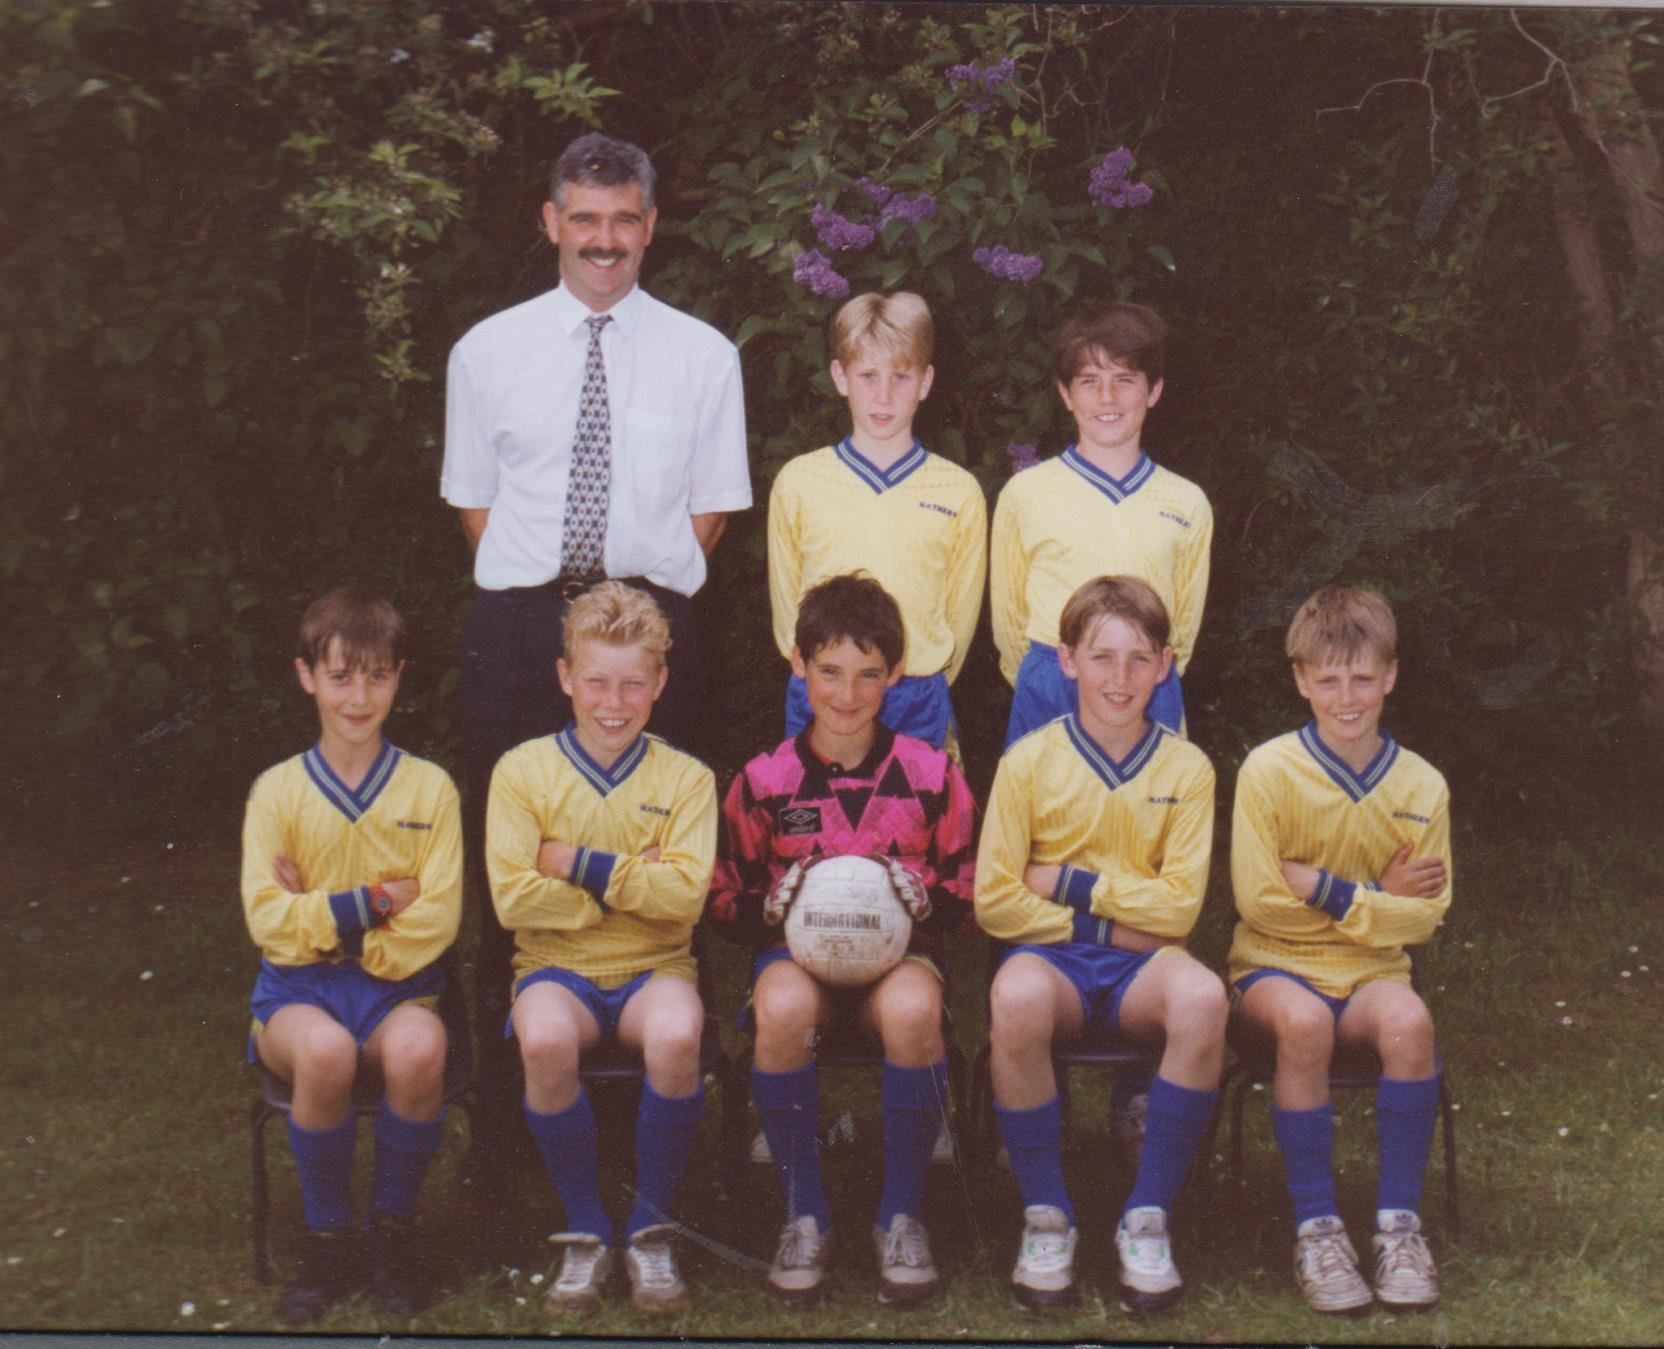 school_football_team_adam_fairweather_et_al_001.jpg